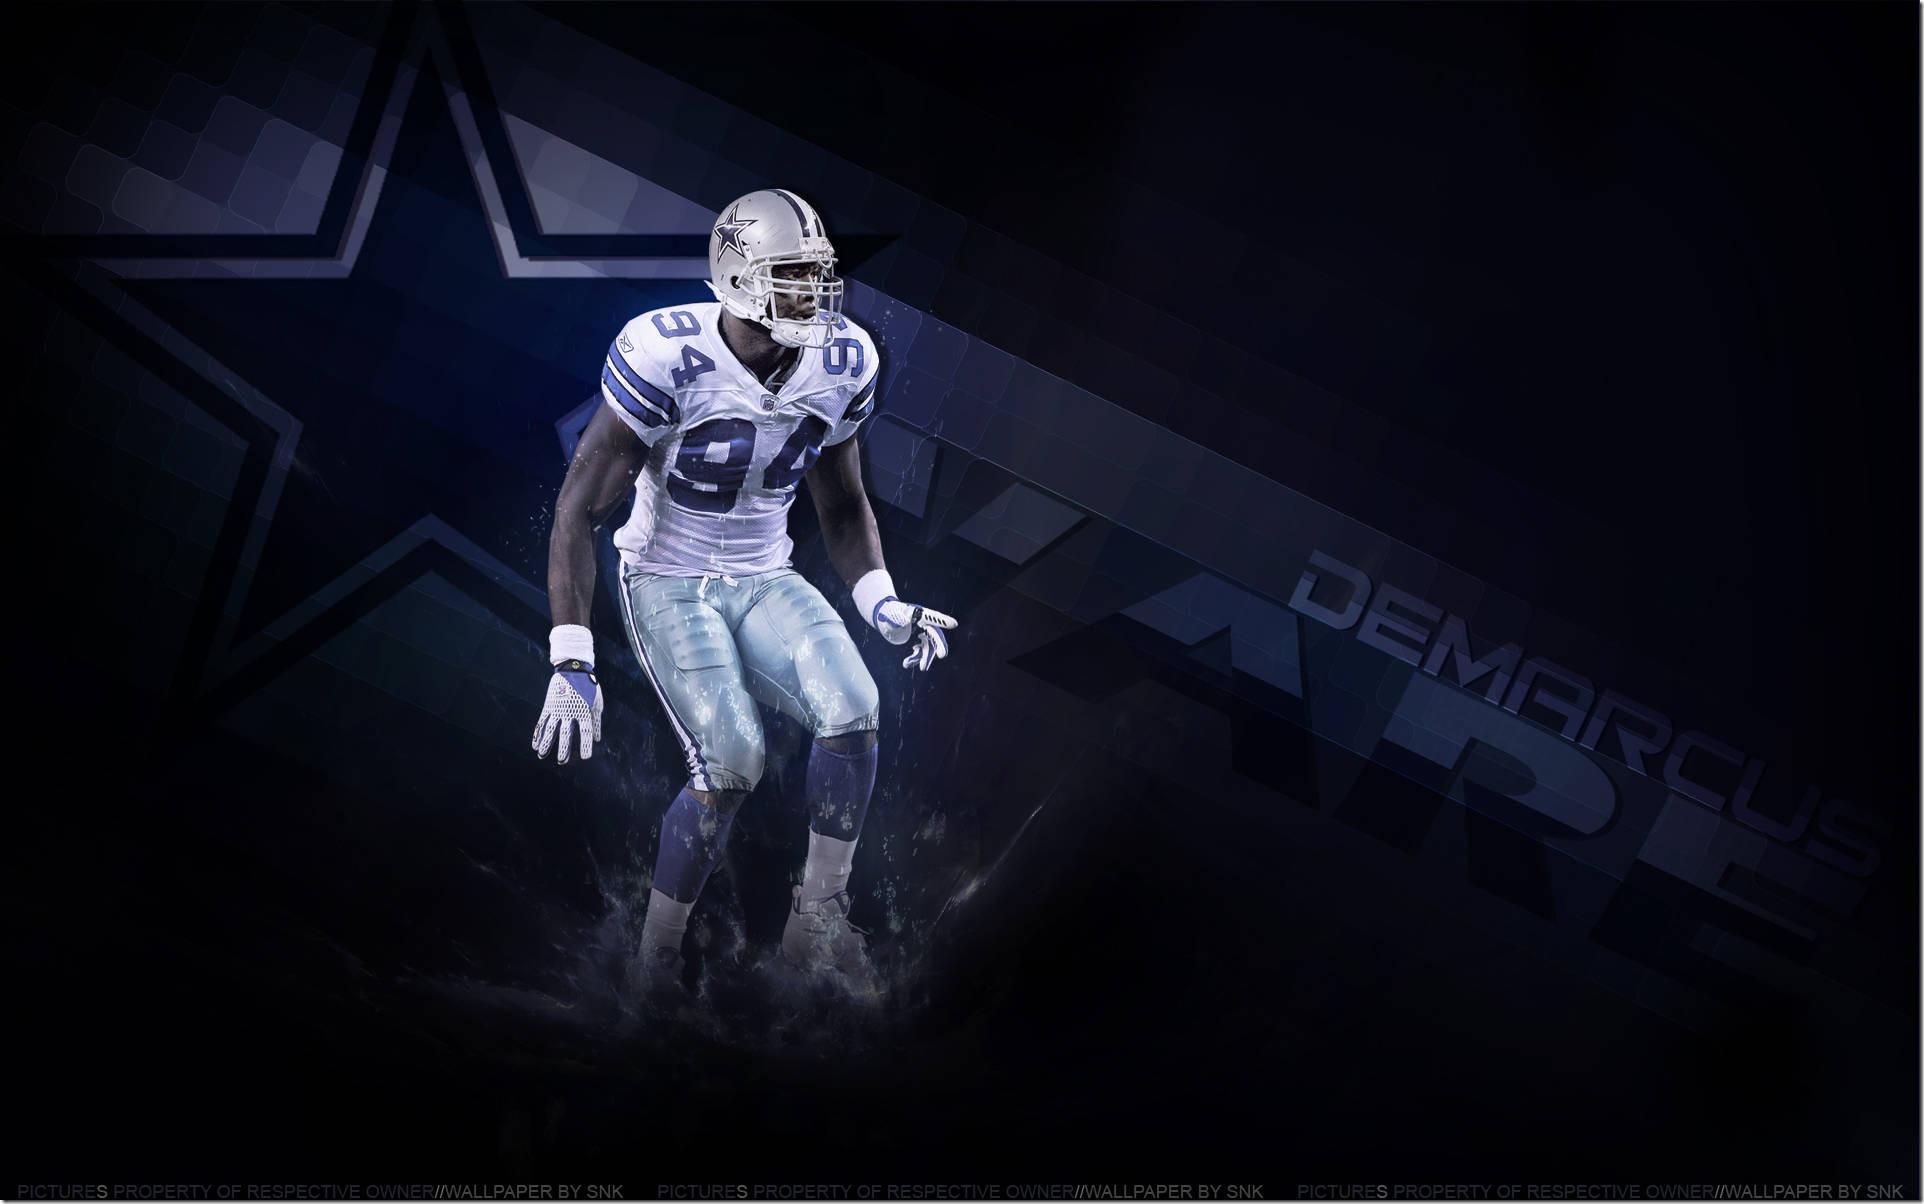 Dallas Cowboys DeMarcus Ware - The Boys Are Back blog